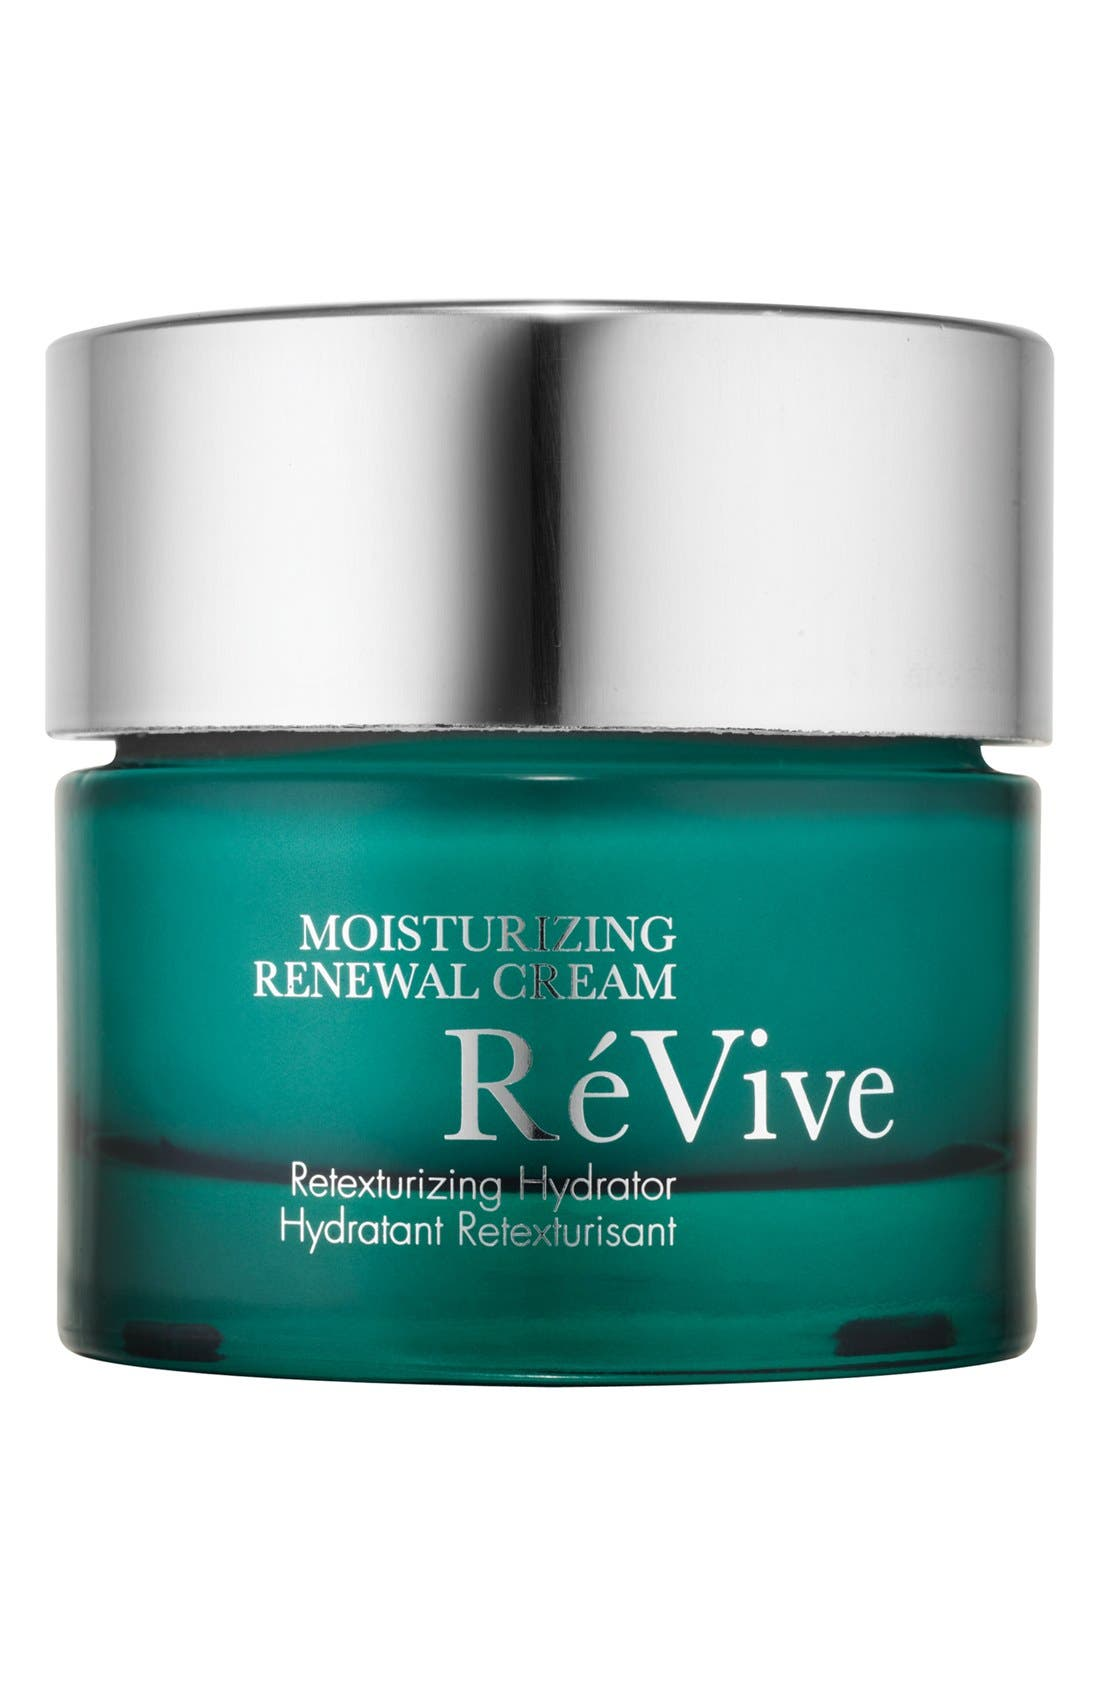 RéVive® Moisturizing Renewal Cream